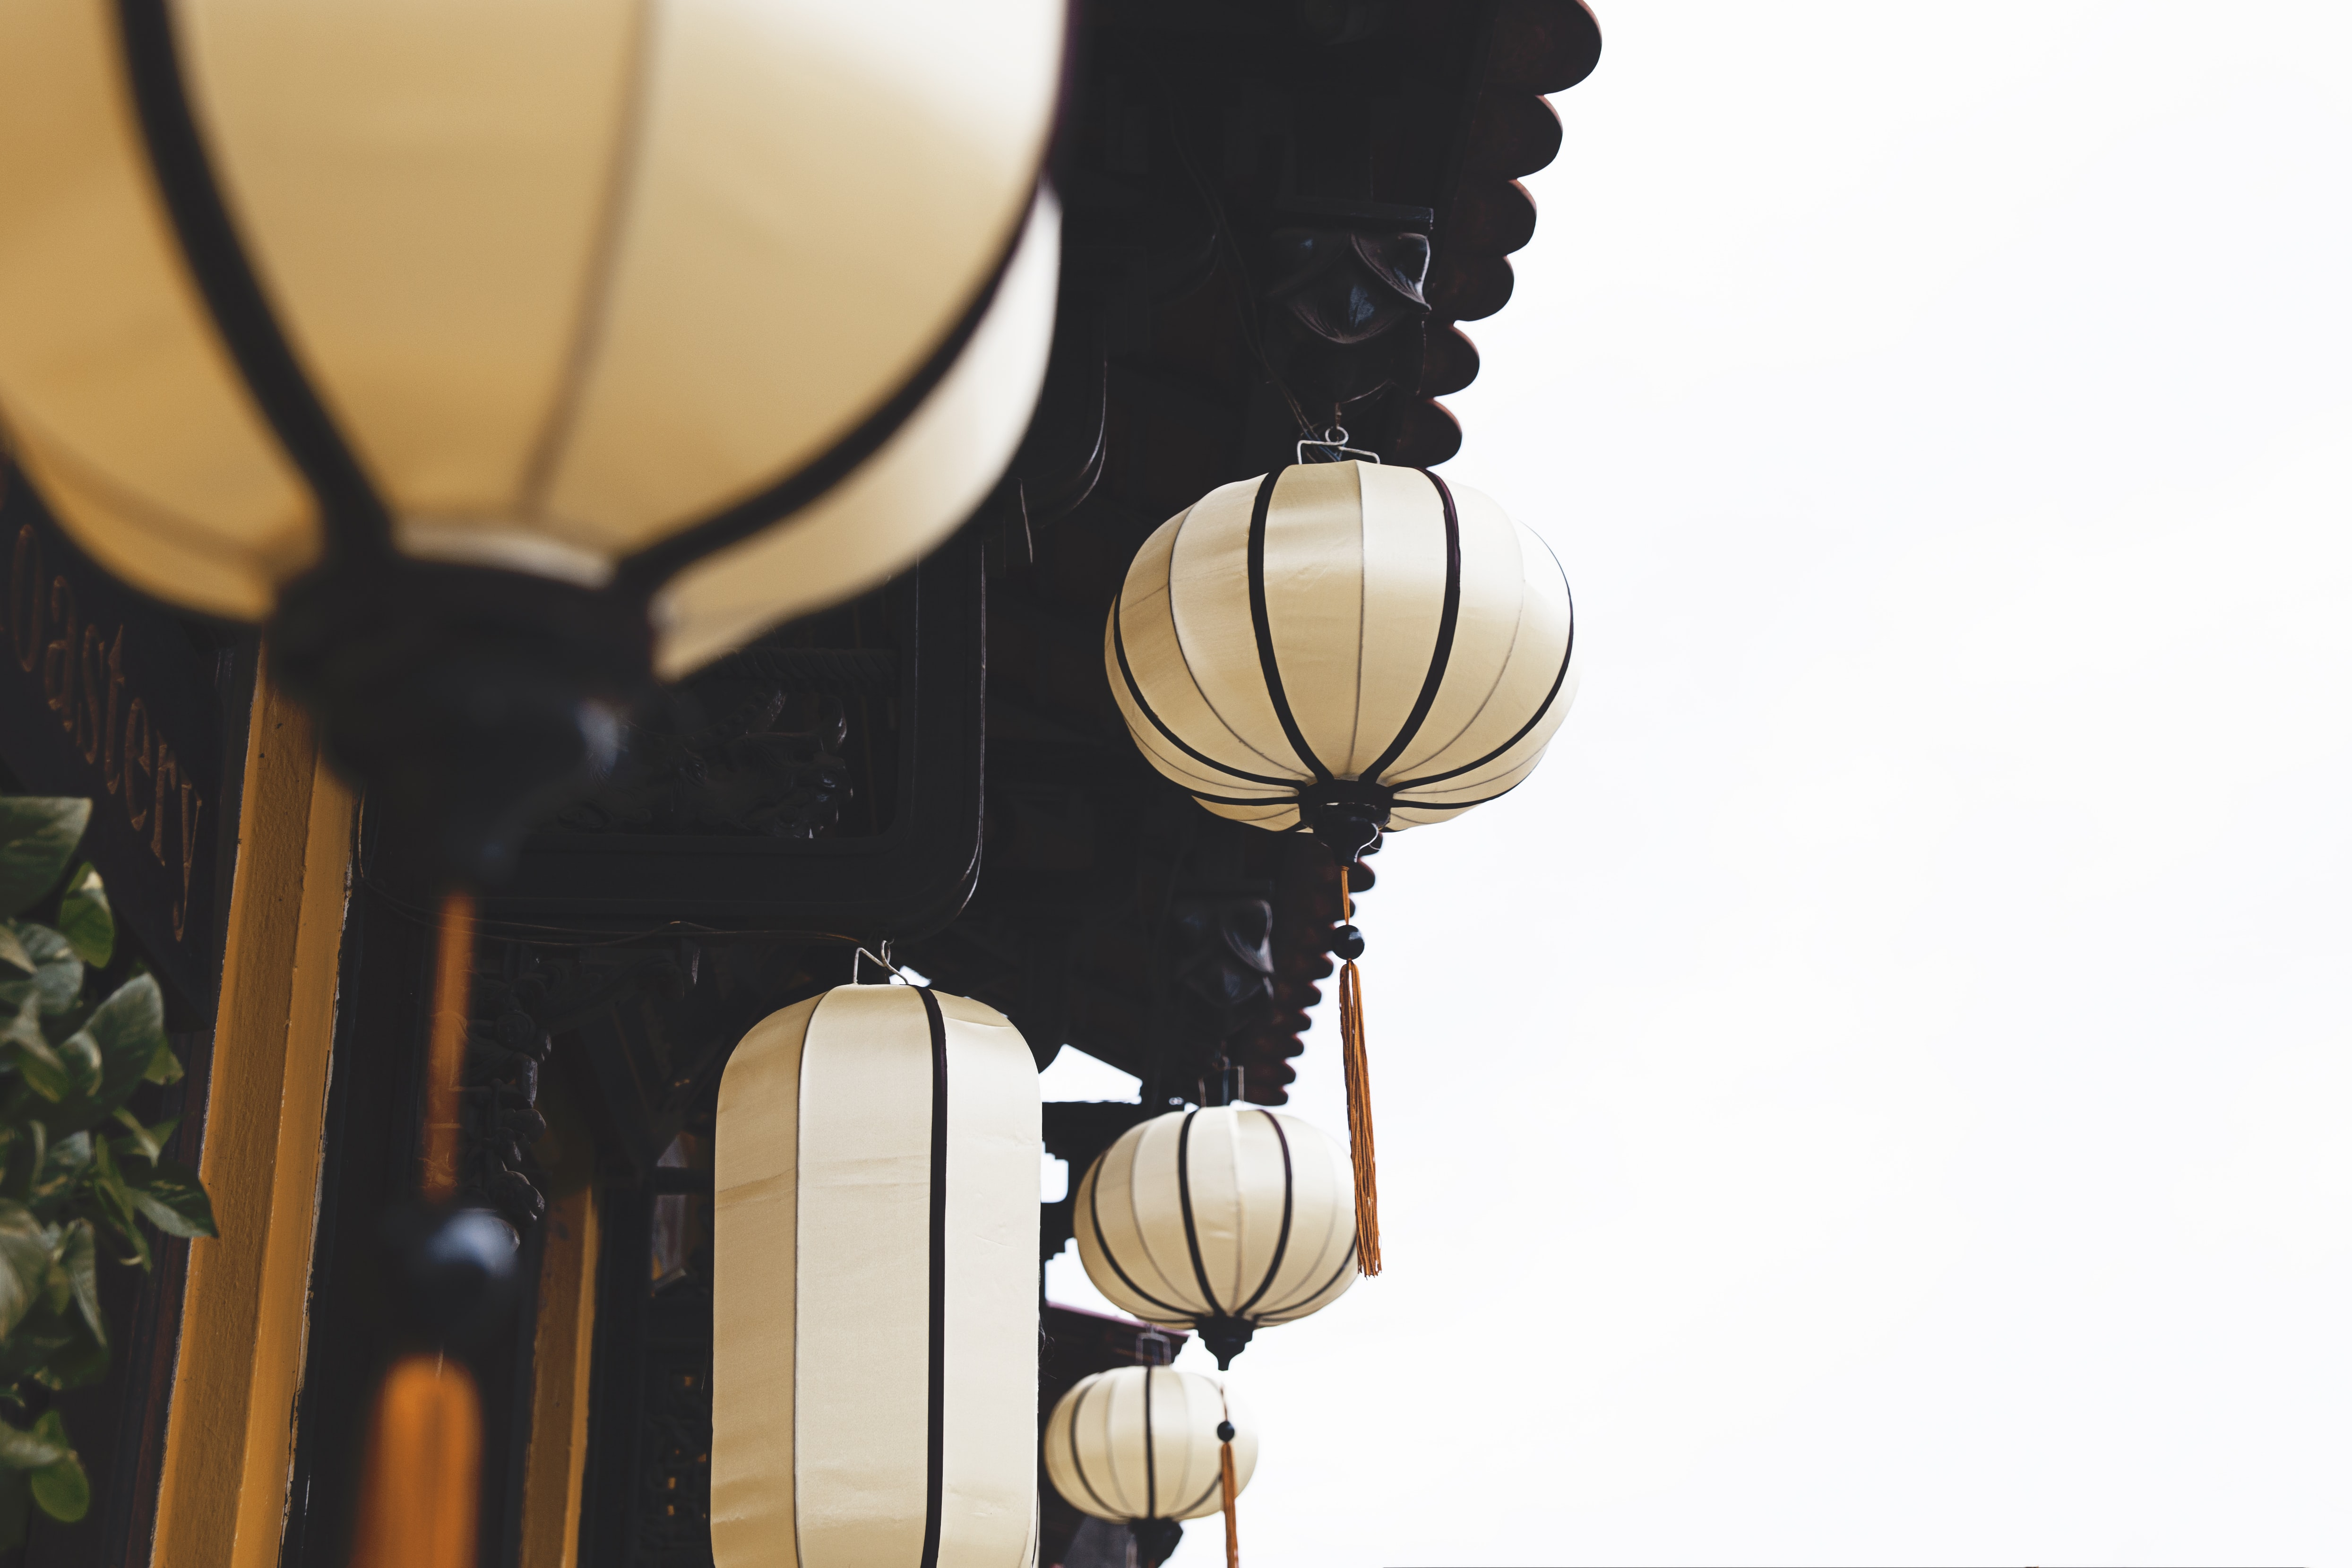 beige lantern hanging near house